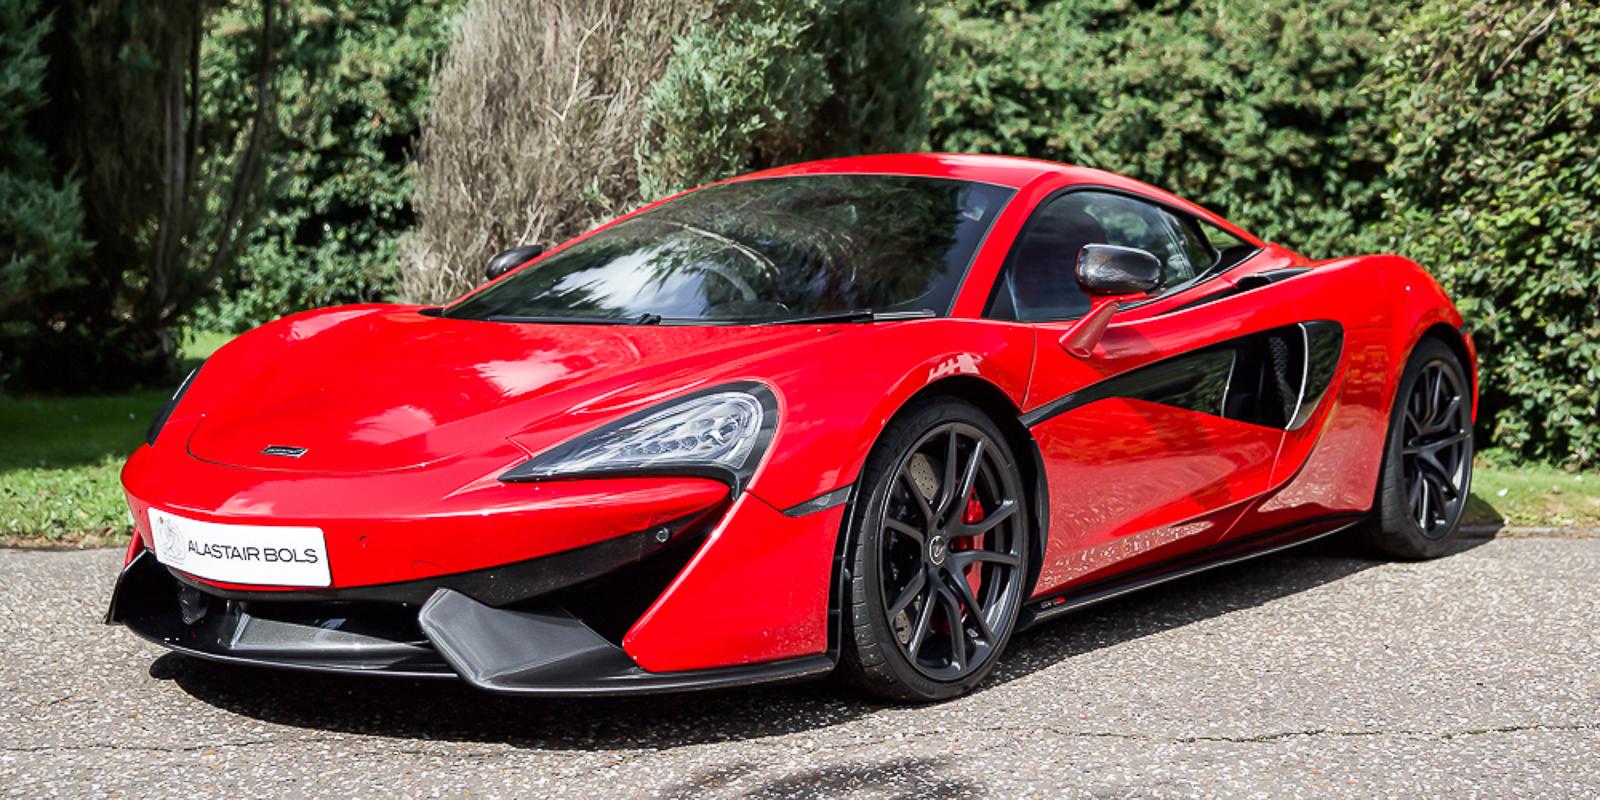 Mclaren For Sale >> McLaren 570S Coupe Vermillion Red - Alastair Bols